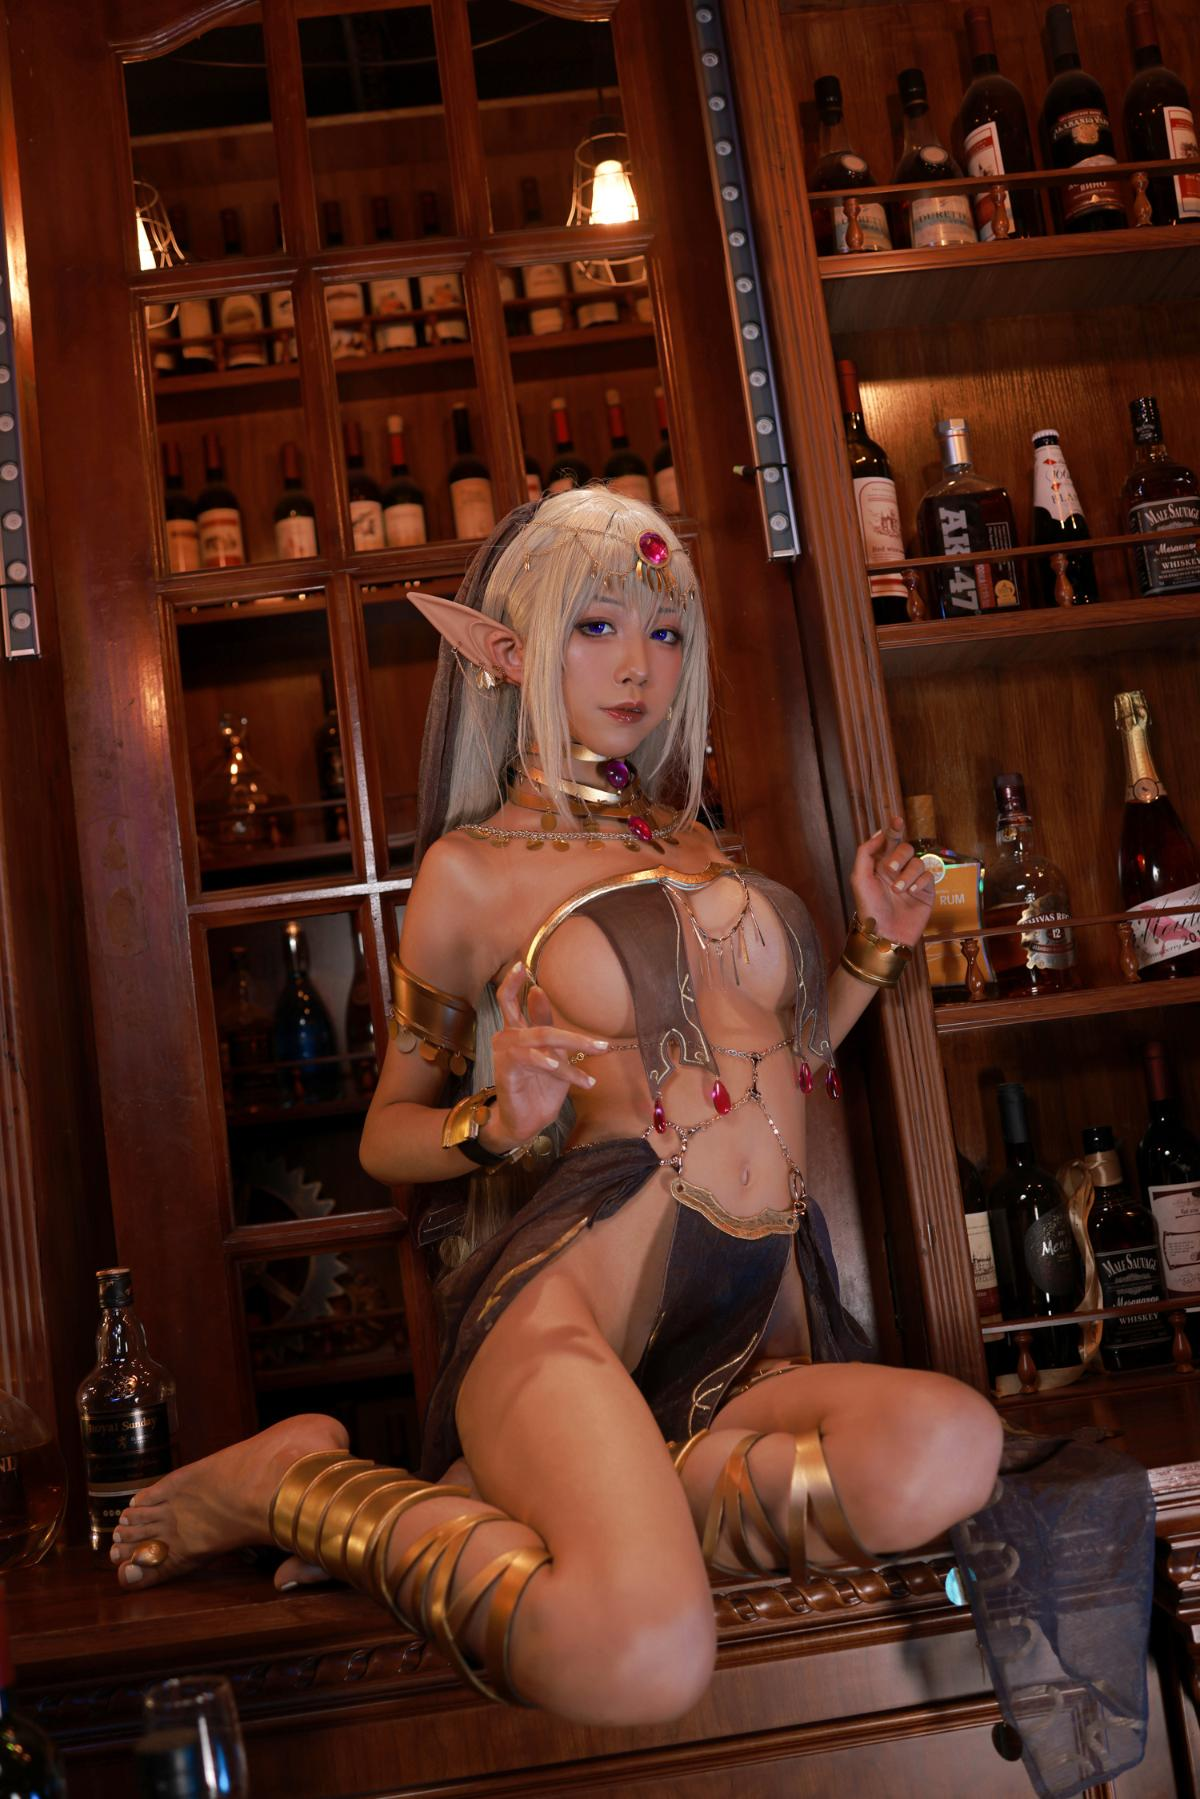 Tan Dancer Elf Succubus Cosplay by Aqua 34